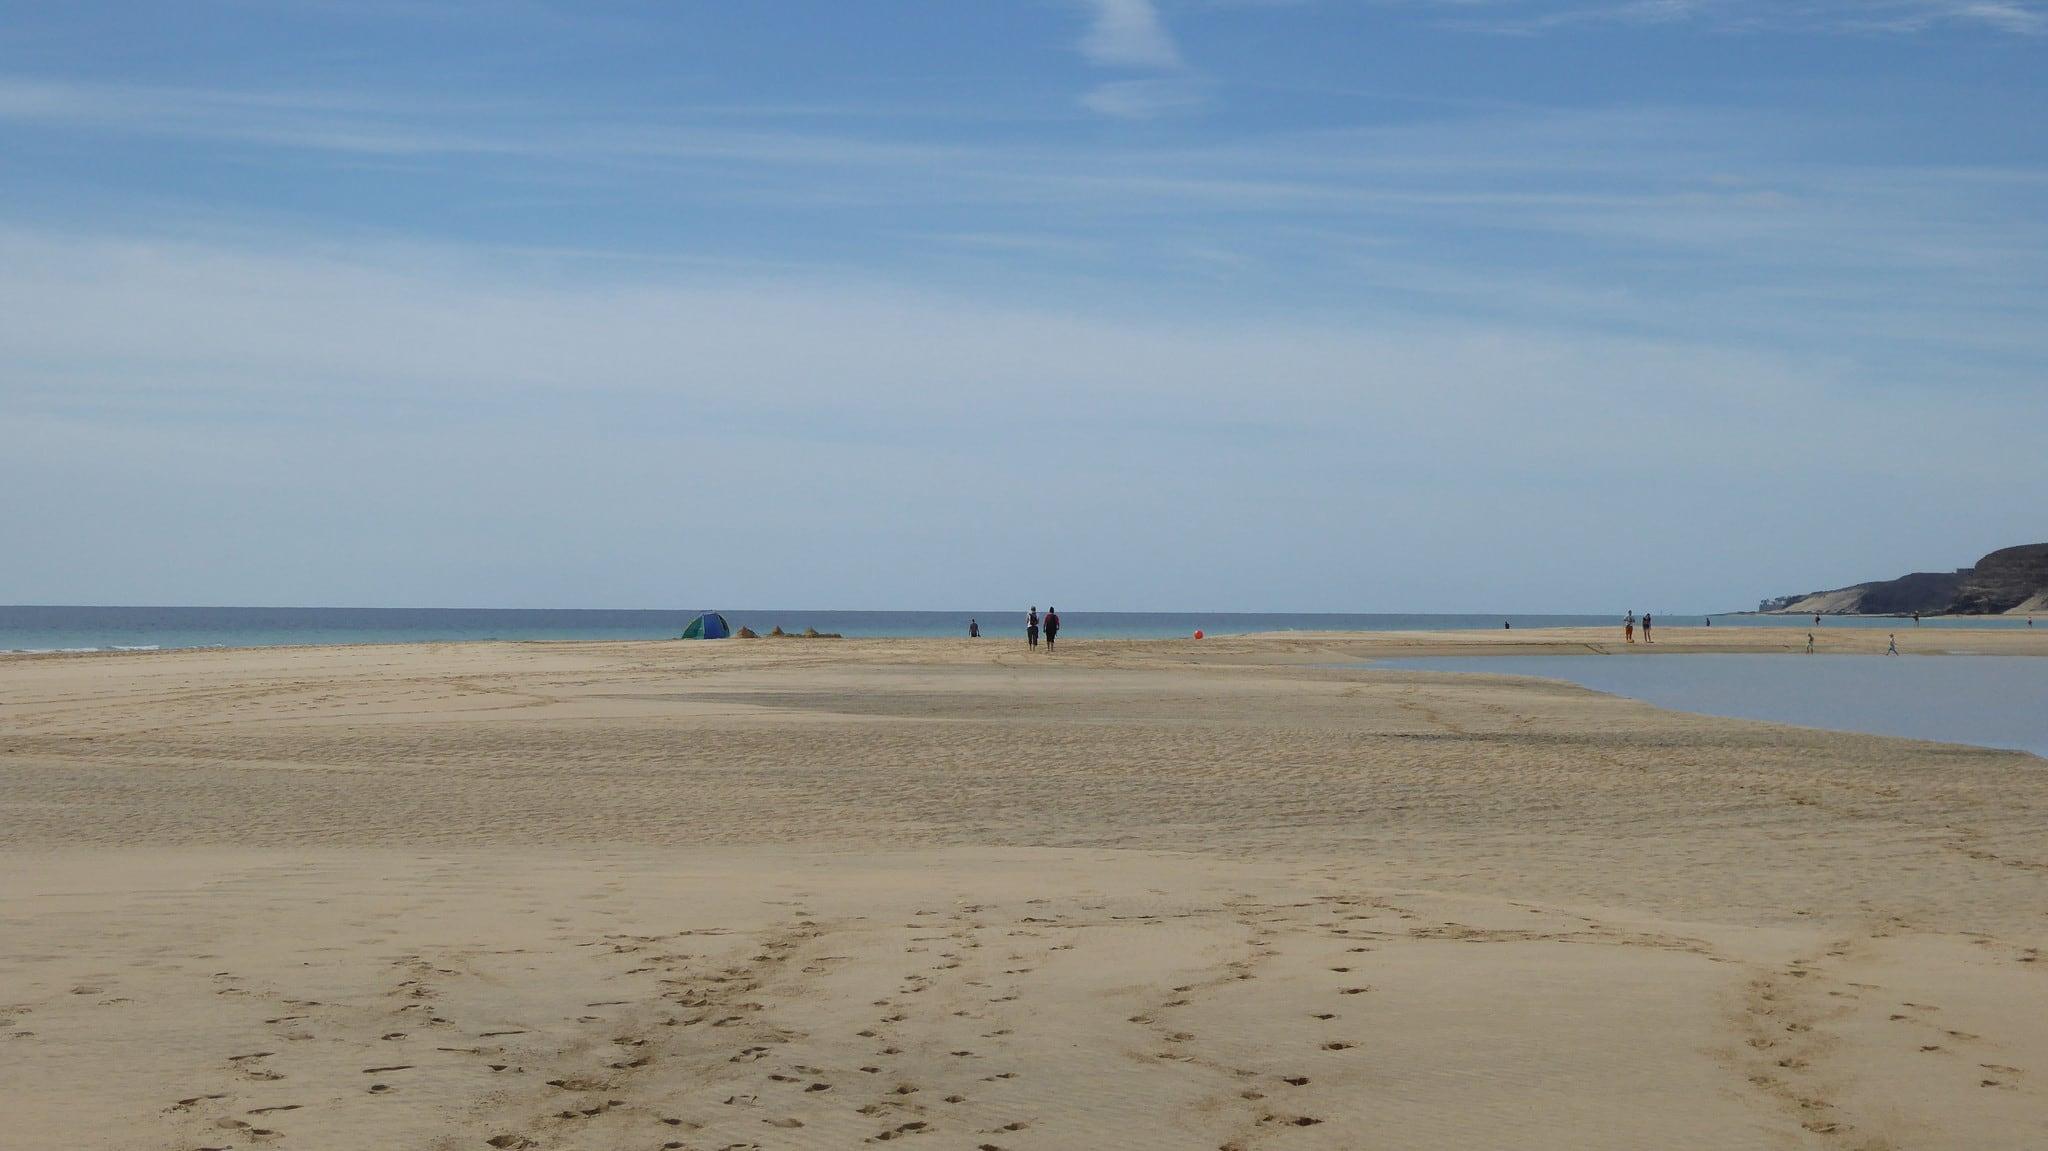 صورة شاطئ بطول 820 متر.